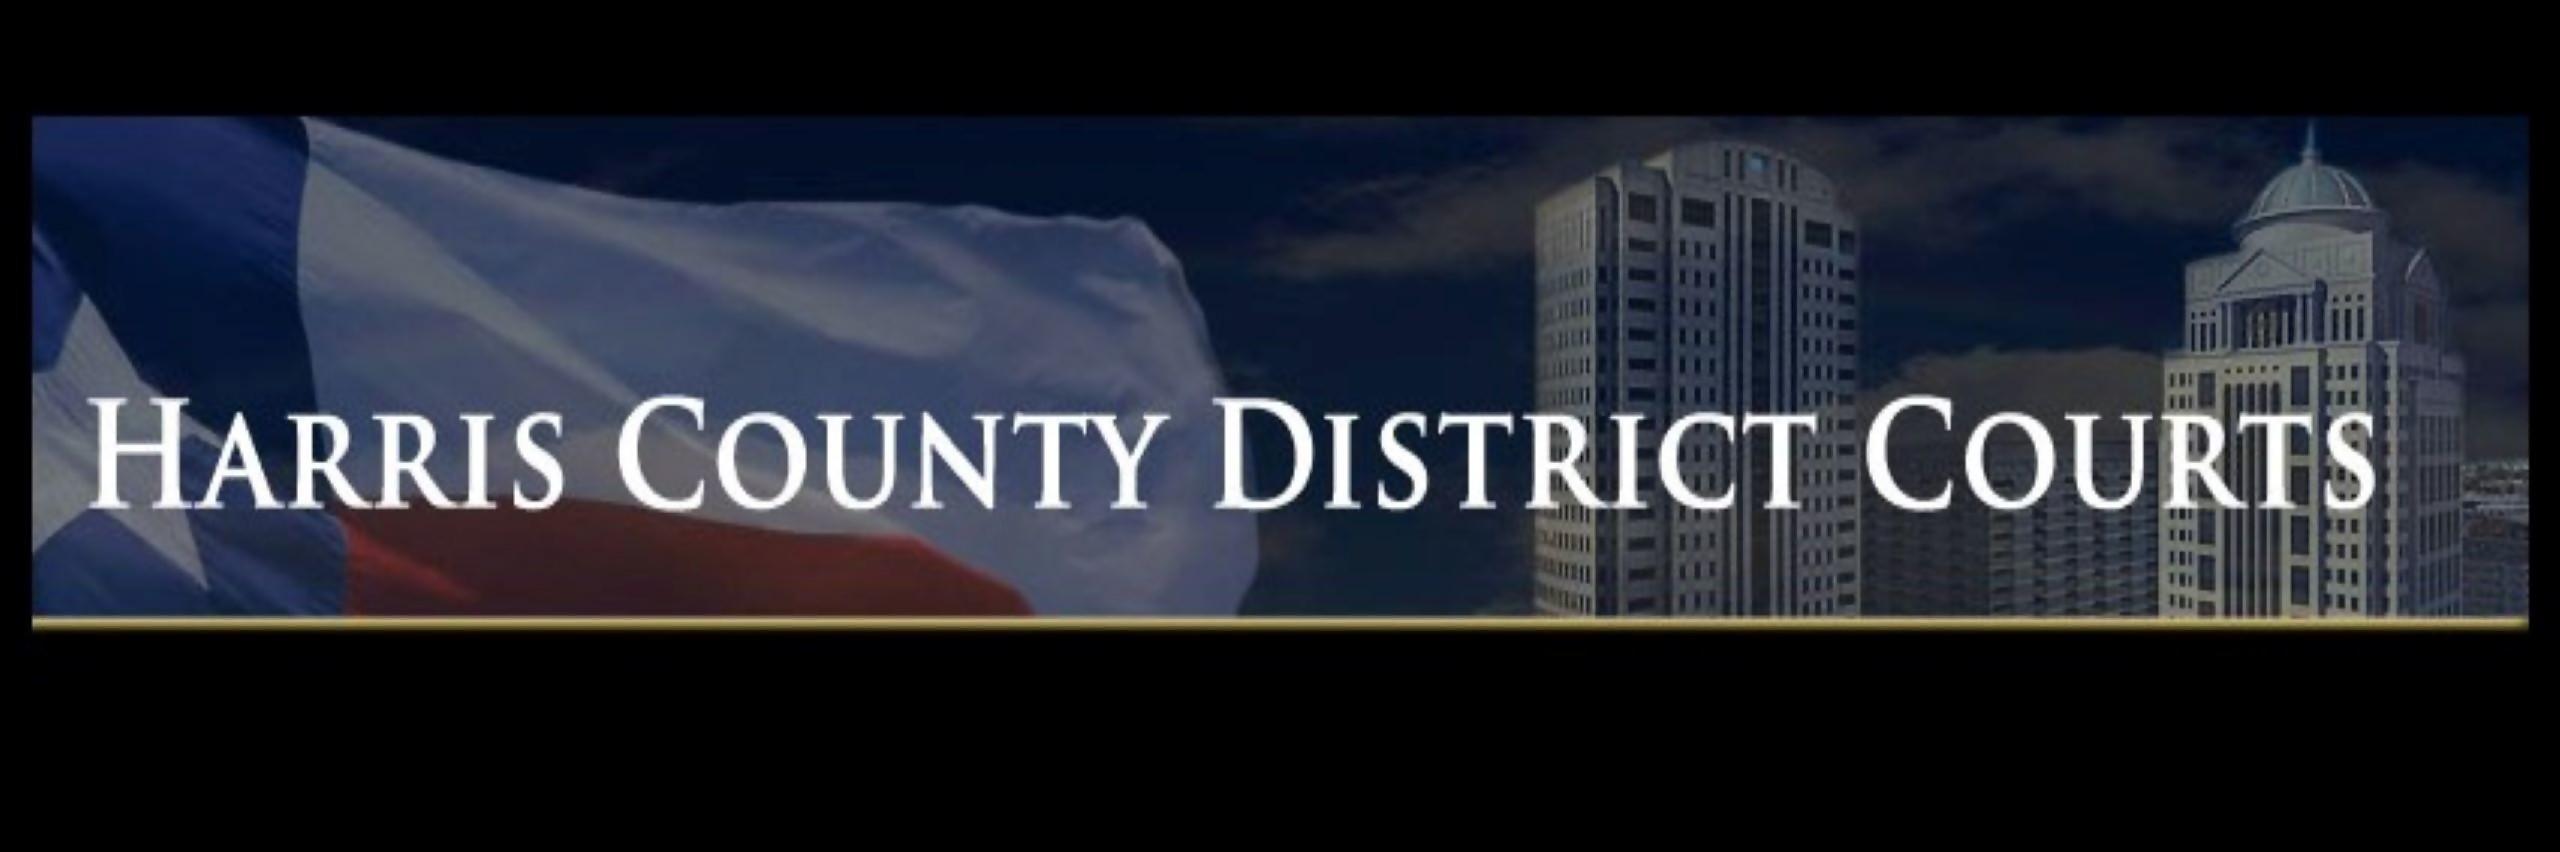 351st District Court - Live Stream